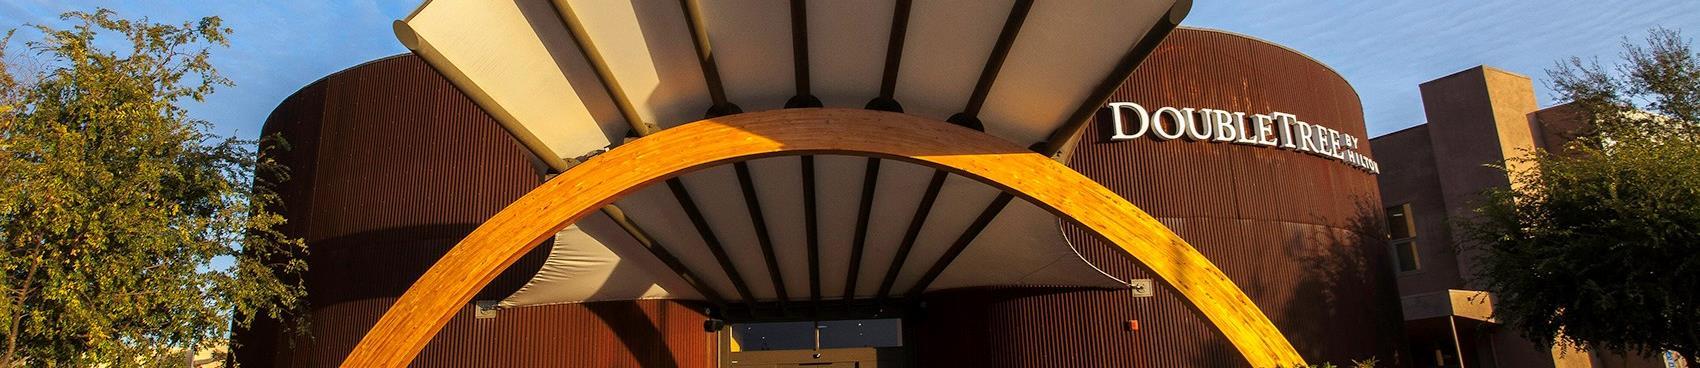 DoubleTree by Hilton Hotel & Spa Napa Valley